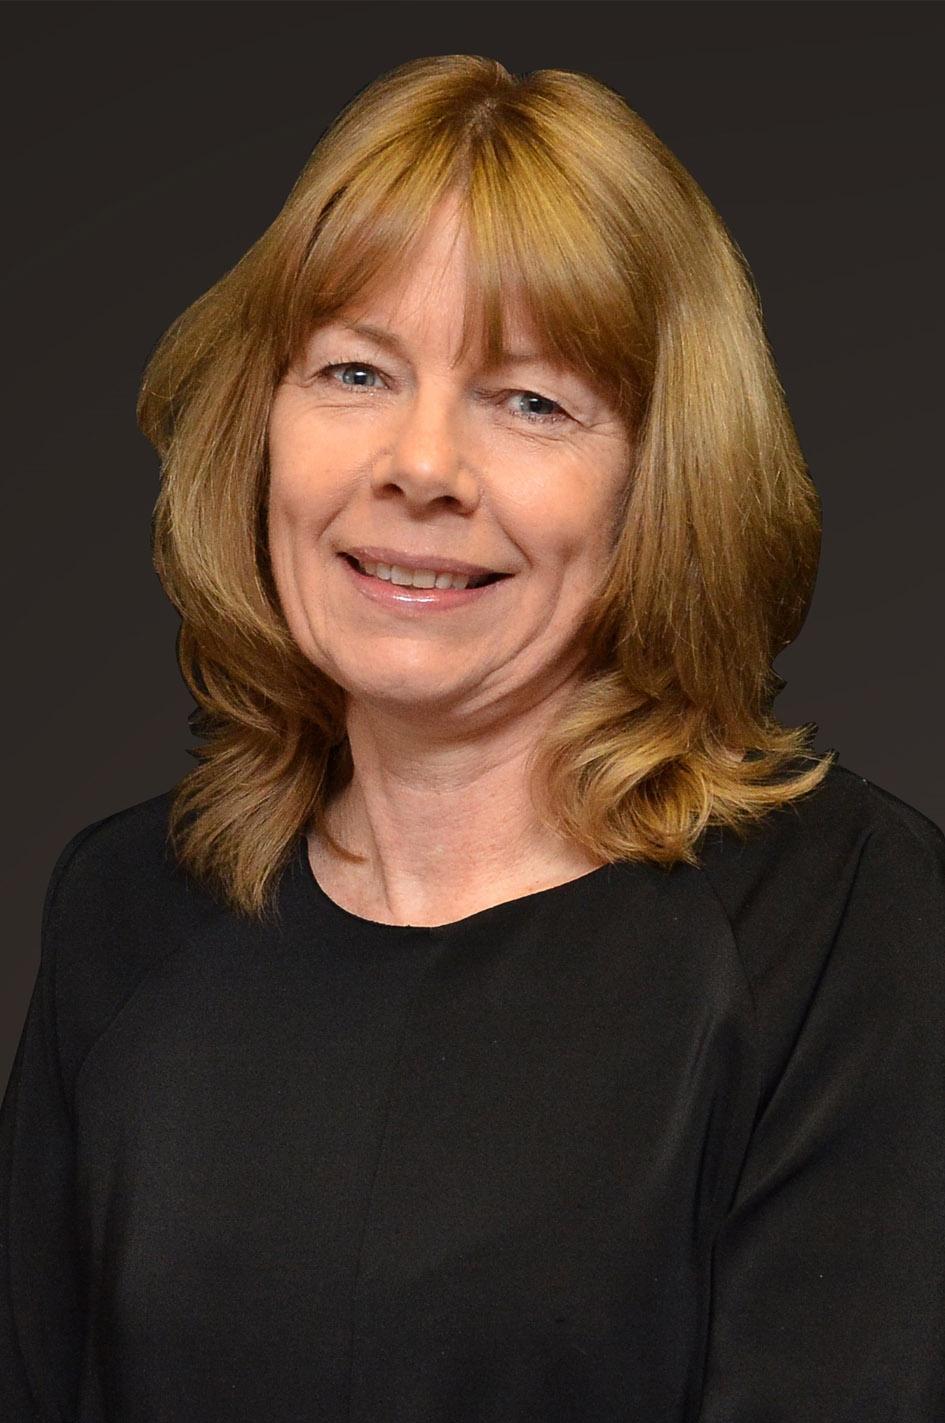 Helen Williams